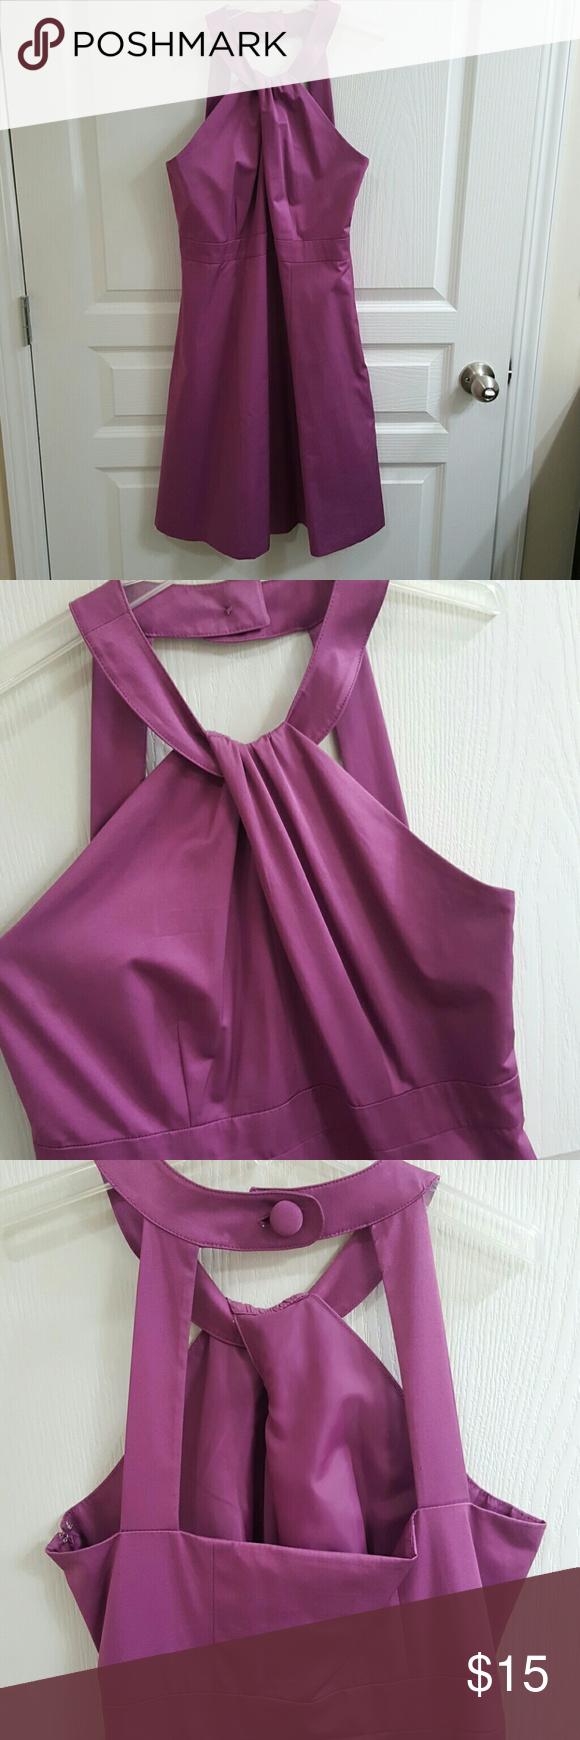 Merona Collection Dress Worn once. Merona Dresses Midi